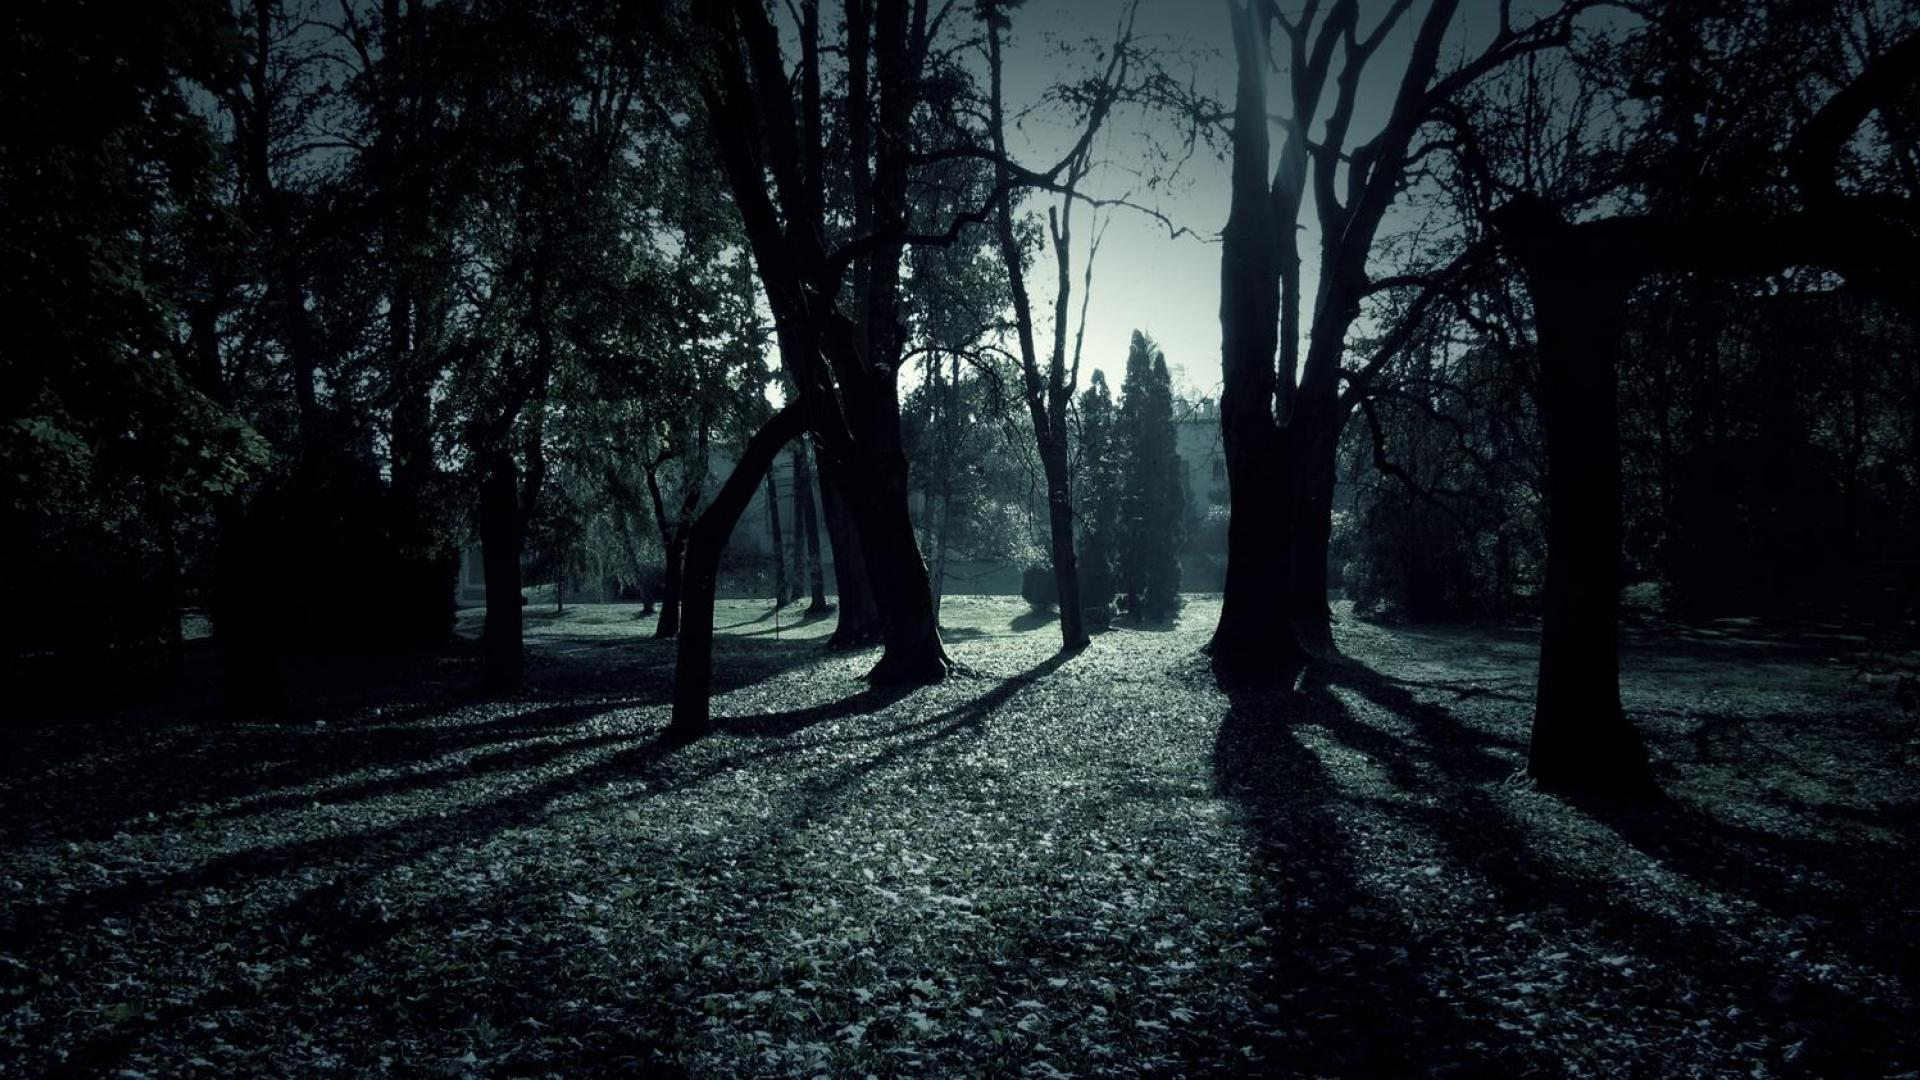 Dark Forest Shadows Hd Wallpaper Wallpapers 1920x1080px